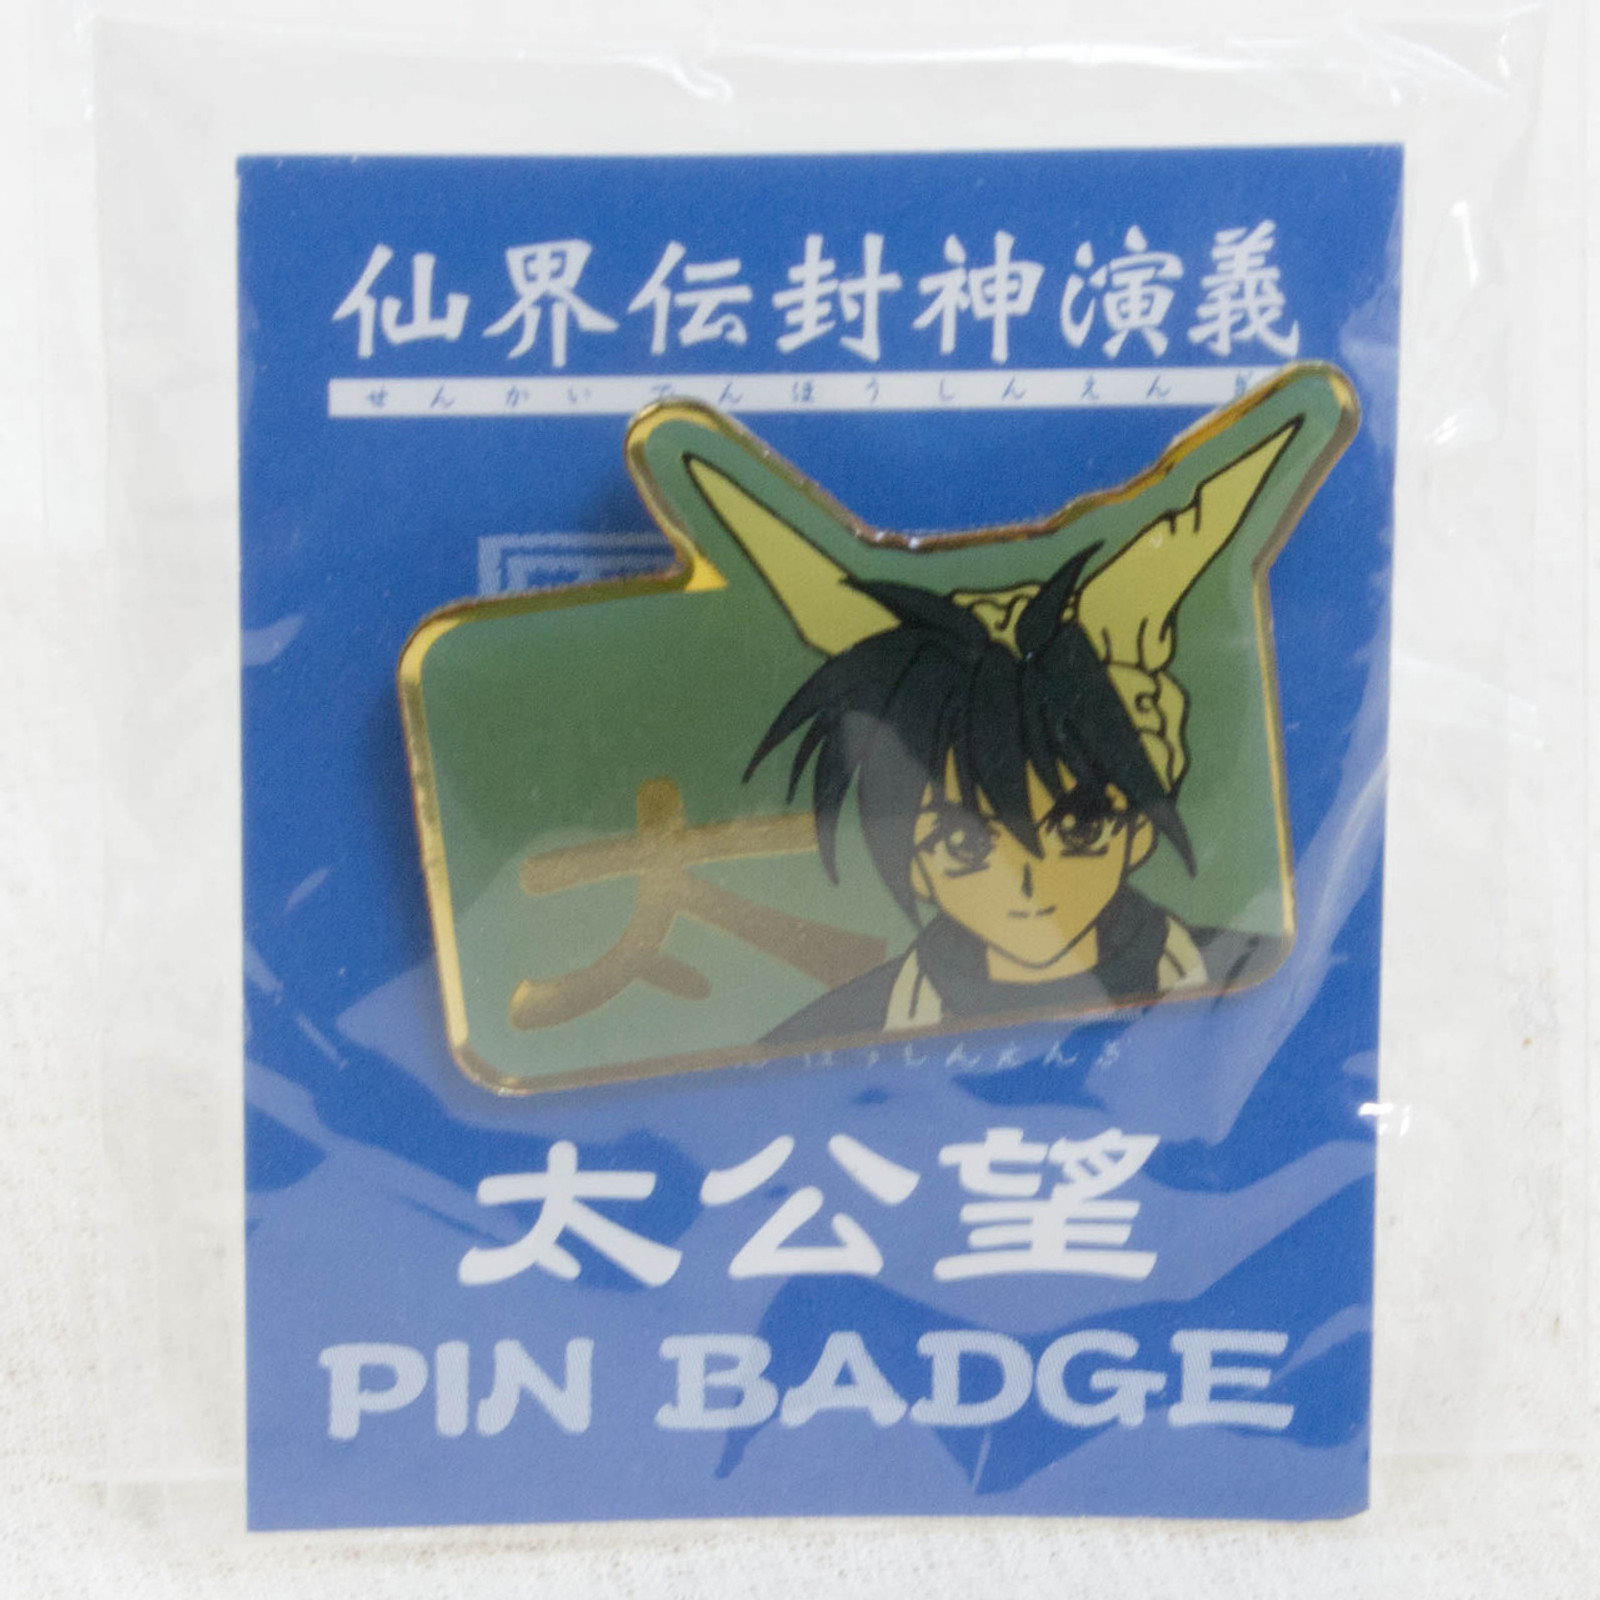 Senkaiden Hoshin Engi Taikobo Mini Metal Pins Badge JAPAN ANIME MANGA